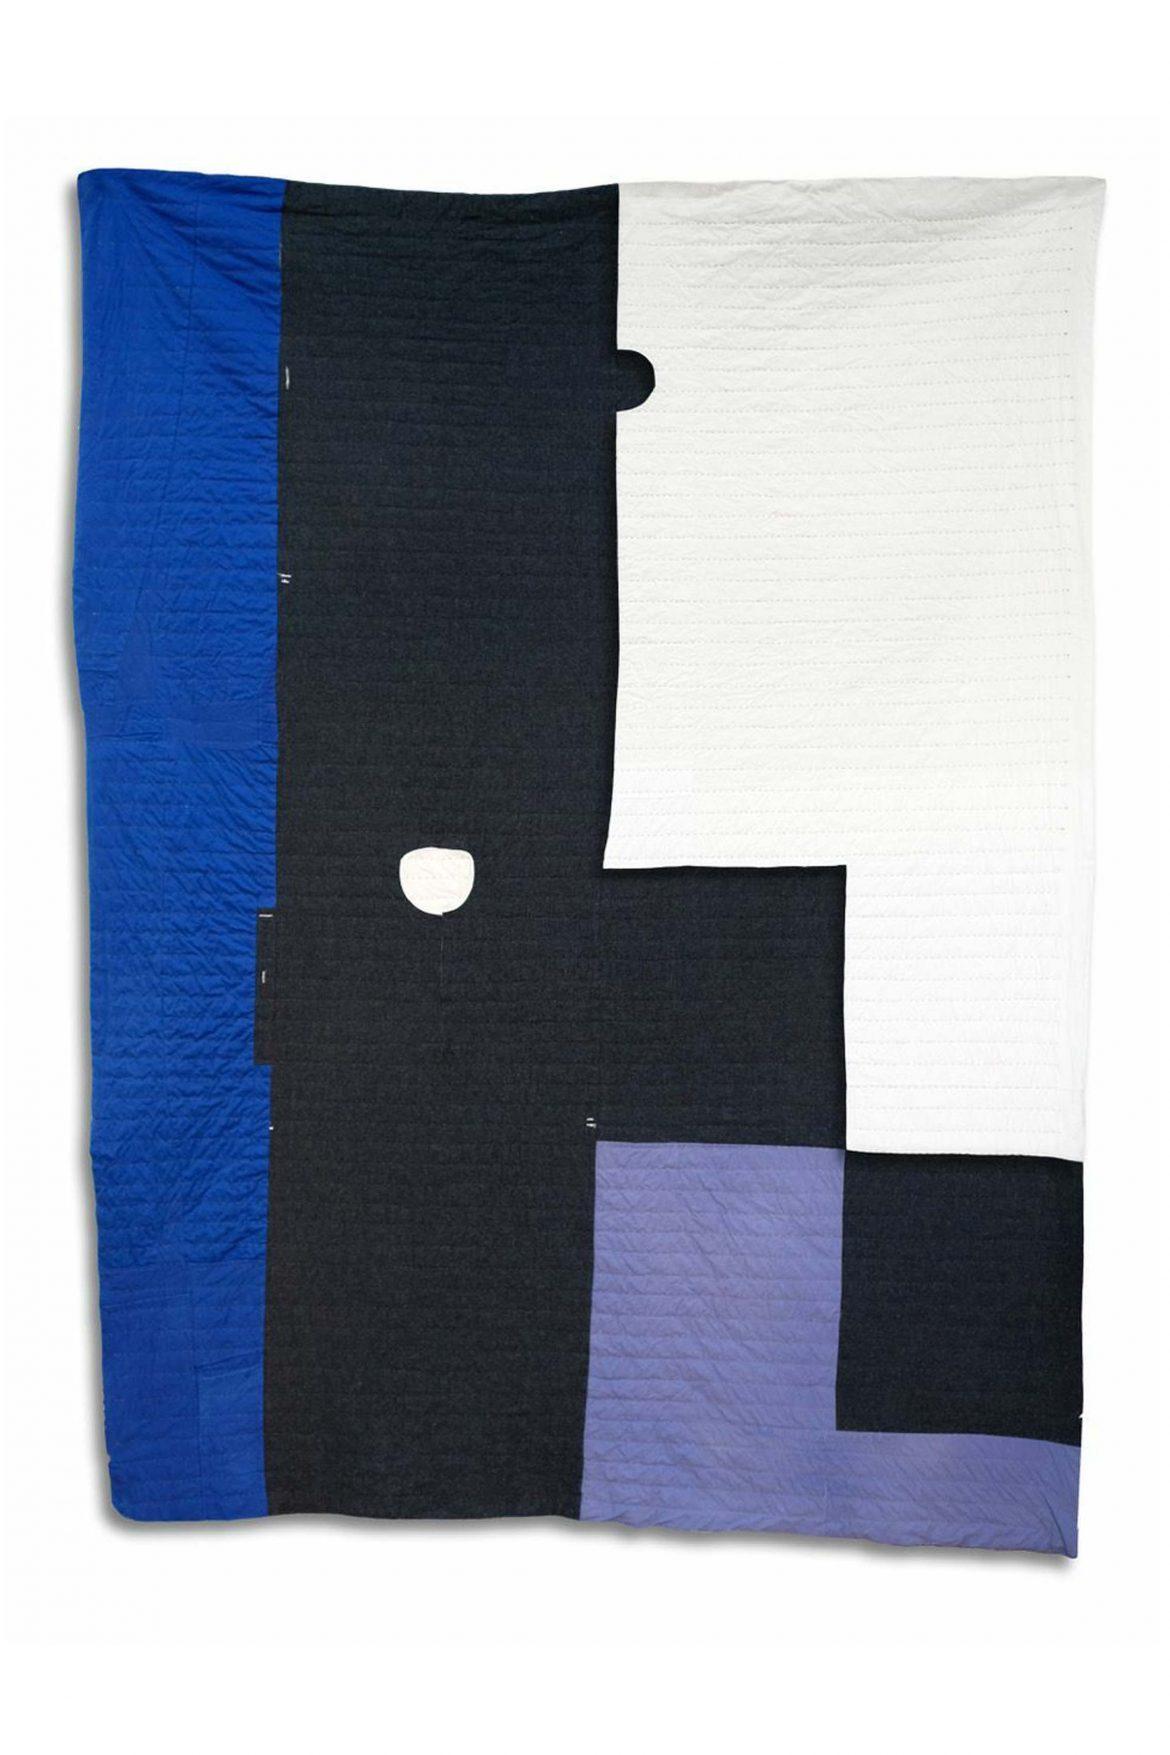 Arrange Whatever Pieces Come Your Way, Quilt 24 (front), 2021, Wool, Cotton and Bamboo, 251 x 190 cm, courtesy: the artists & Linn Lühn, Düsseldorf